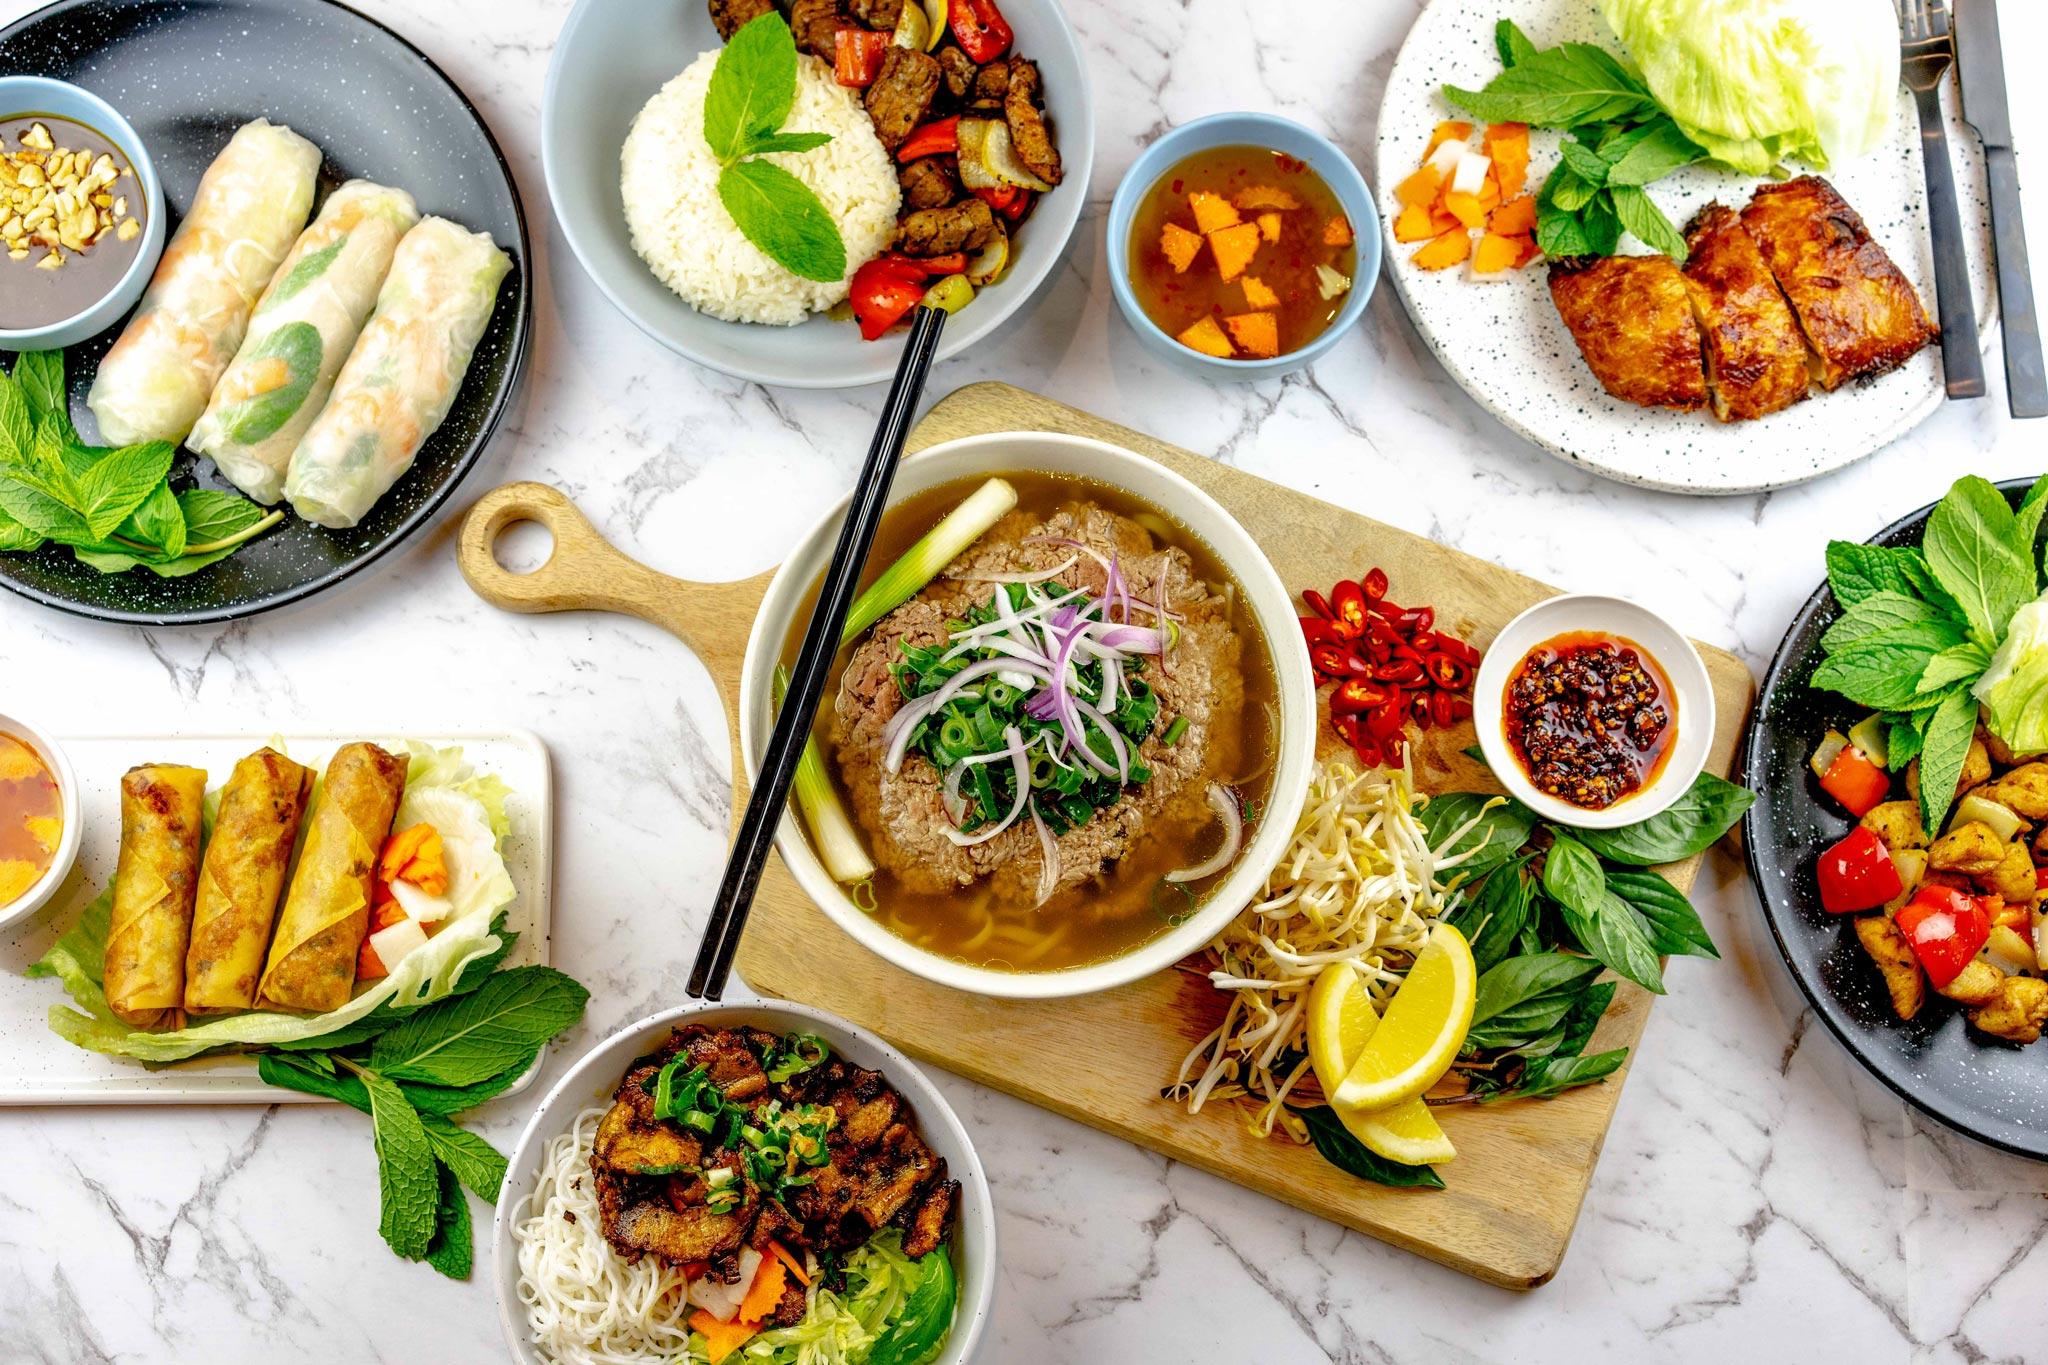 PhoMeOi_FoodImages-10.jpg